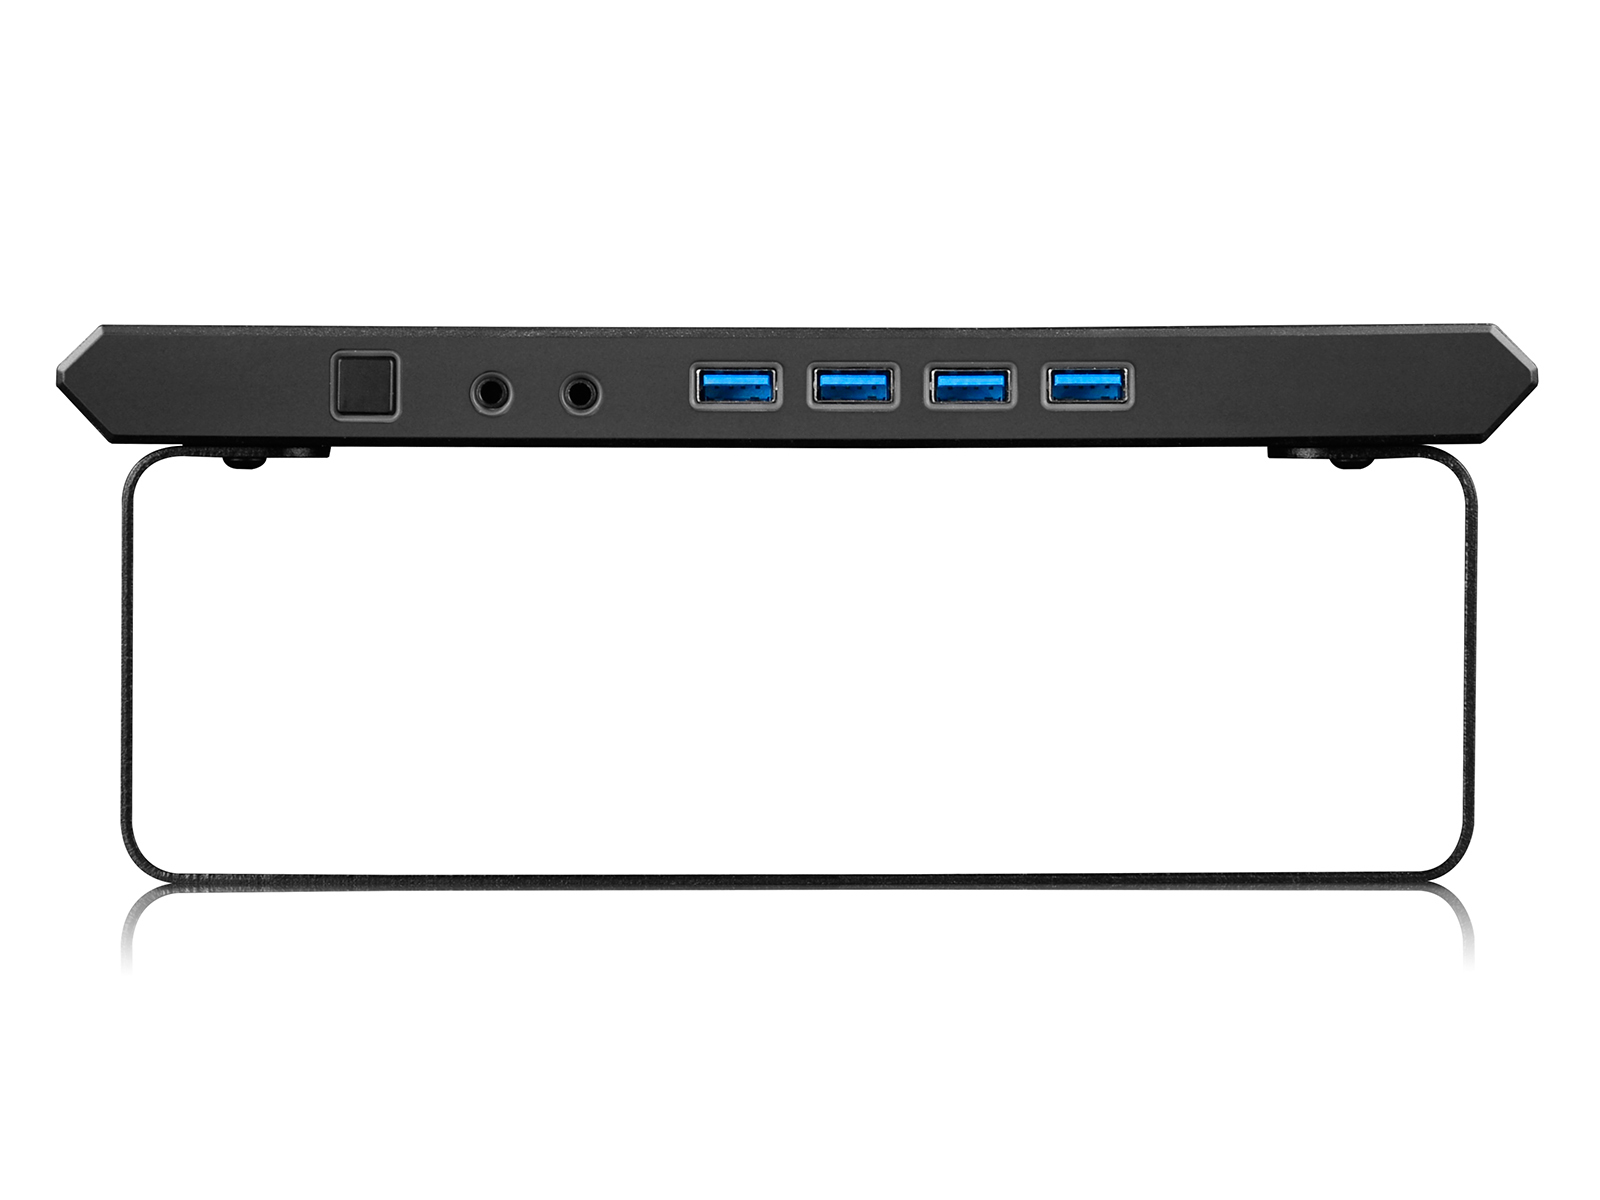 Deepcool: M-Desk F3 Smart Monitor Stand With USB 3.0 Hub image